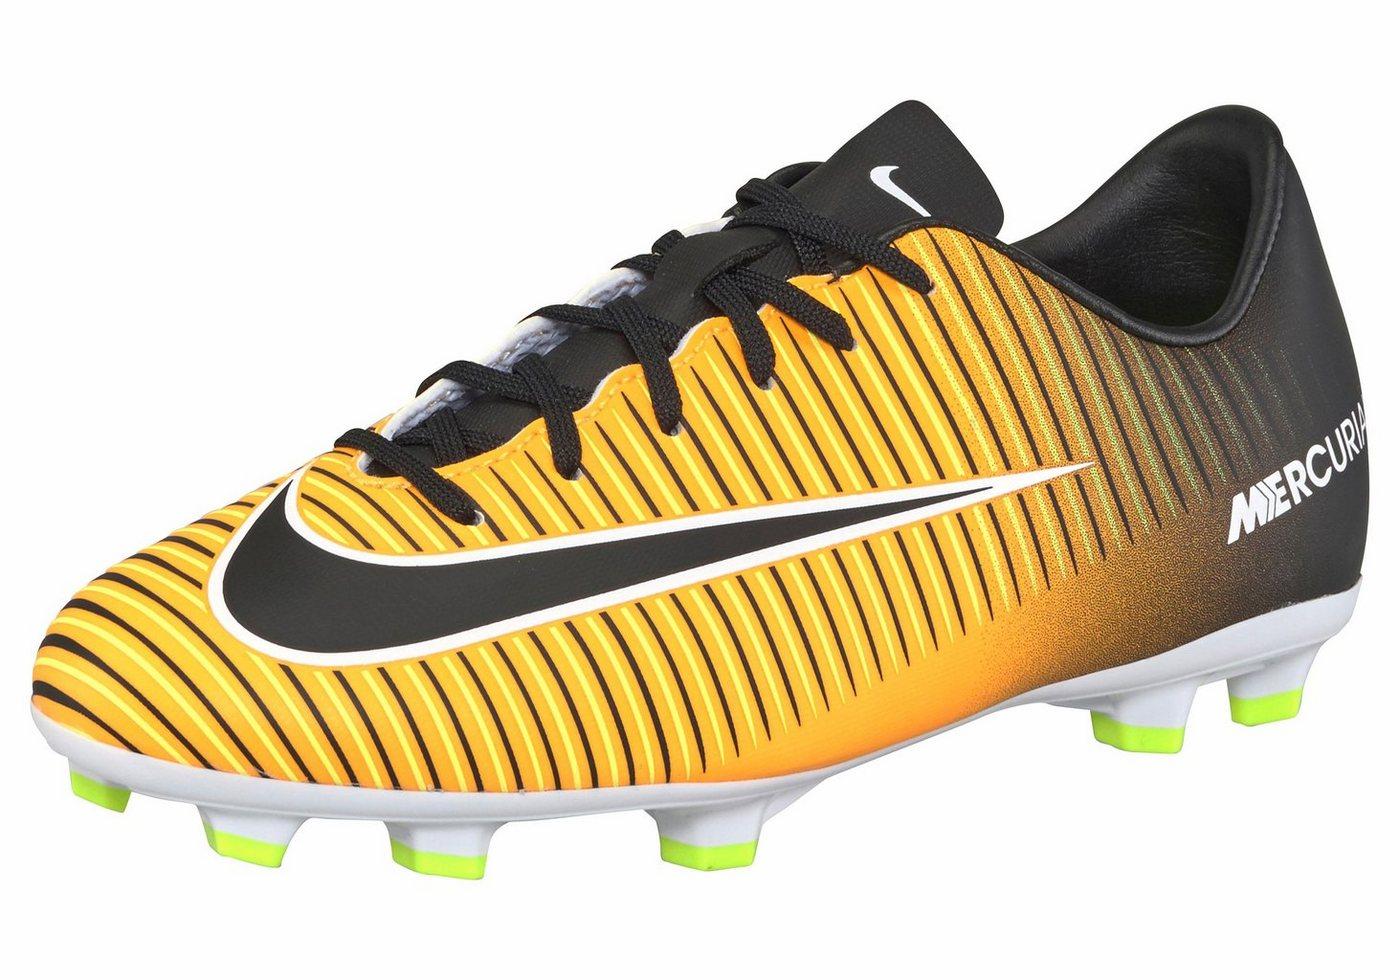 Nike »JR Mercurial Victory VI FG« Fußballschuh